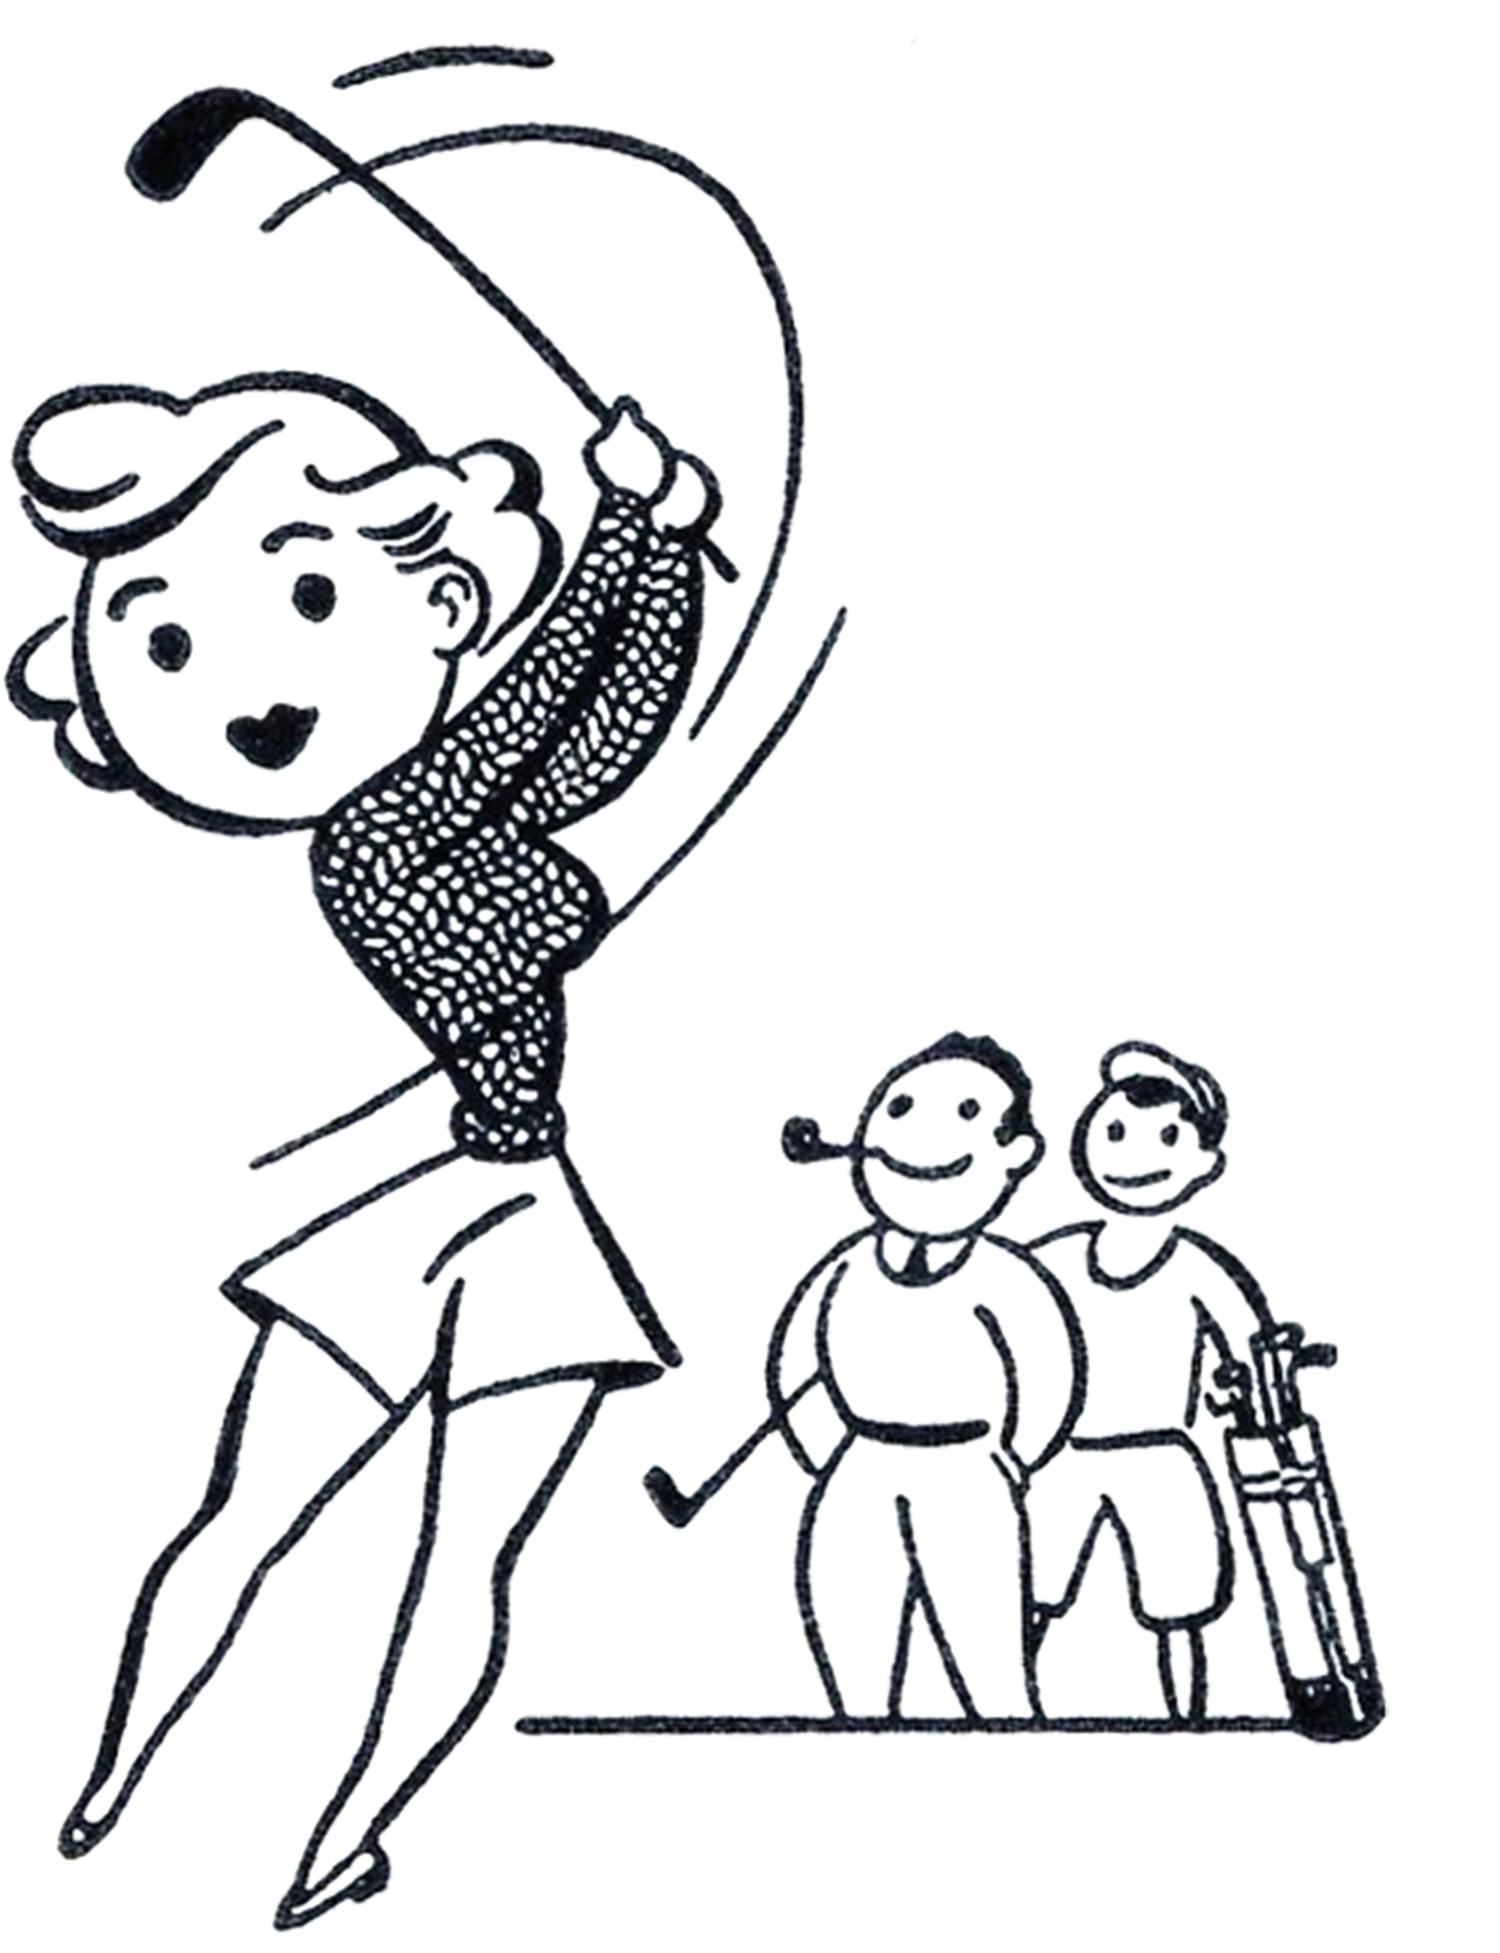 Christmas woman golf clipart jpg stock Retro Golf Clip Art - Funny! - The Graphics Fairy jpg stock